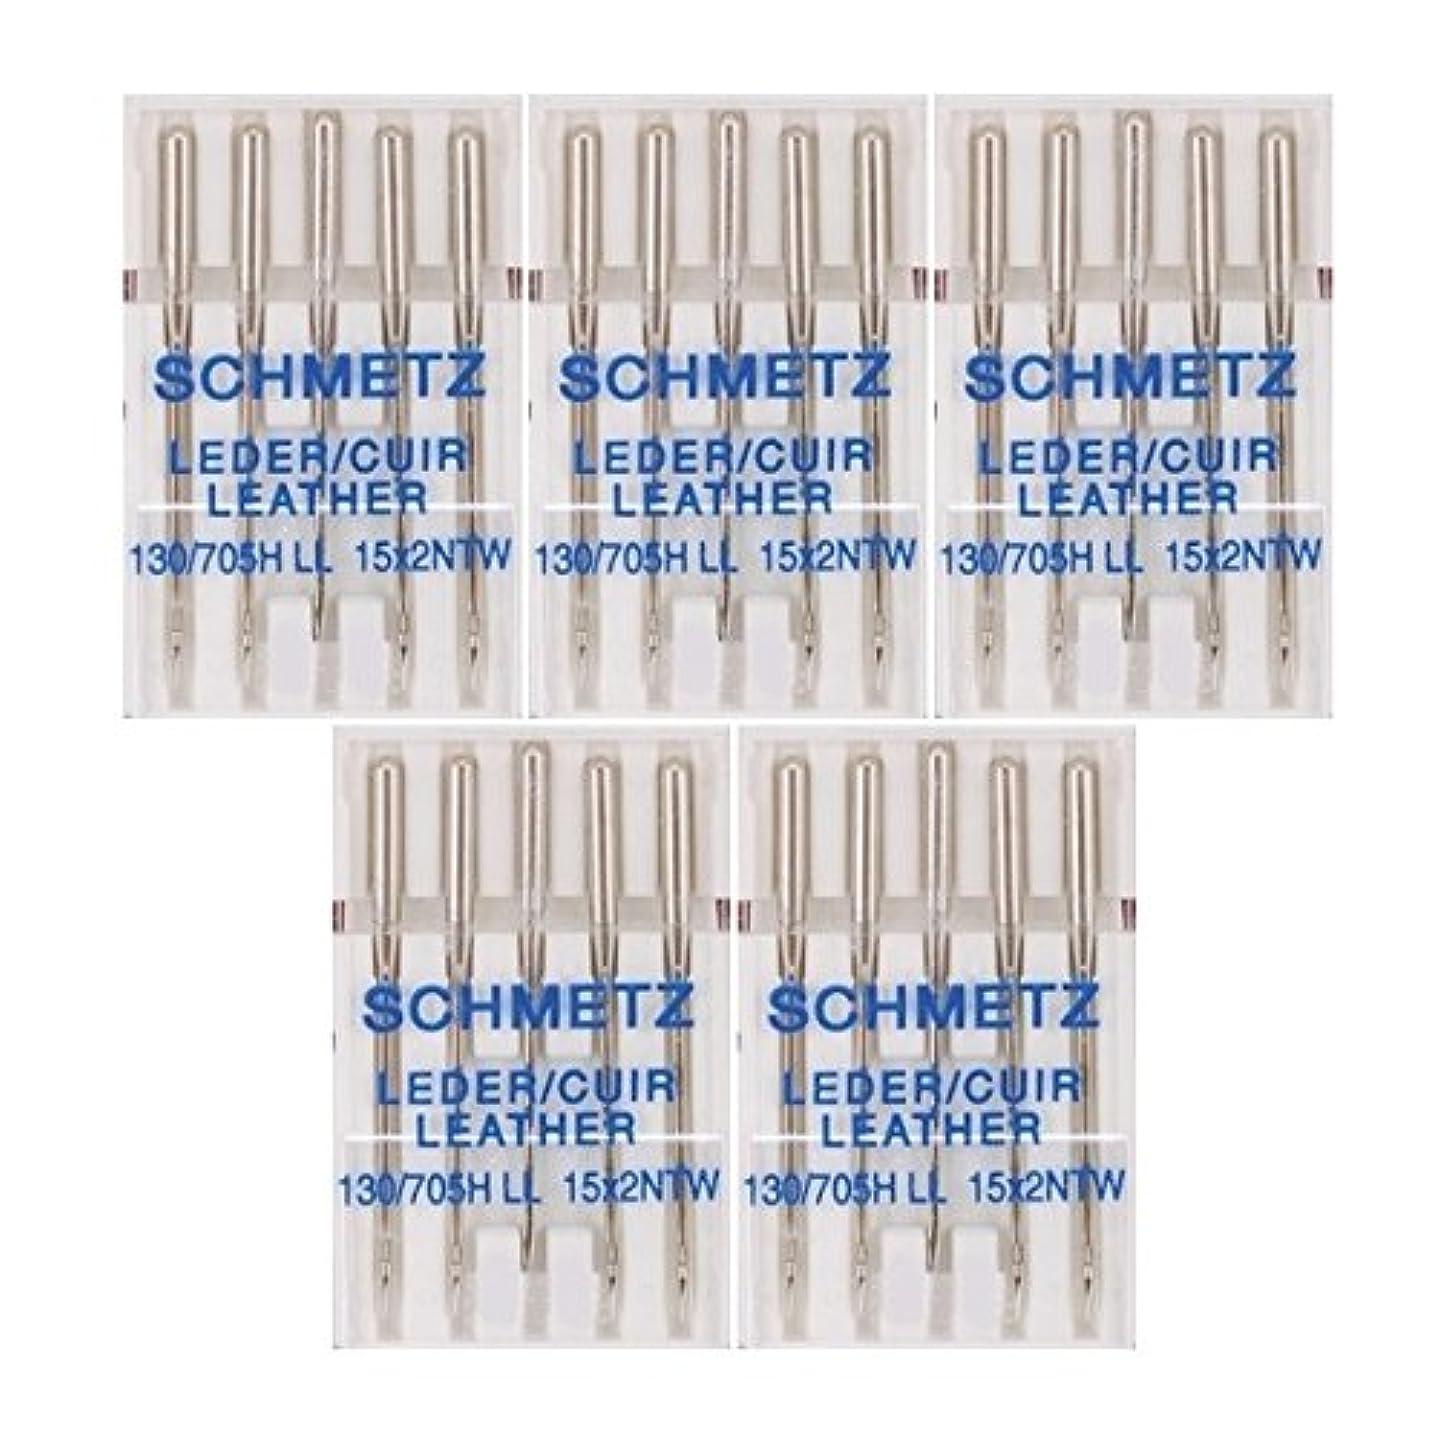 25 Schmetz Leather Sewing Machine Needles 130/705H LL 15x2NTW Size 90/14